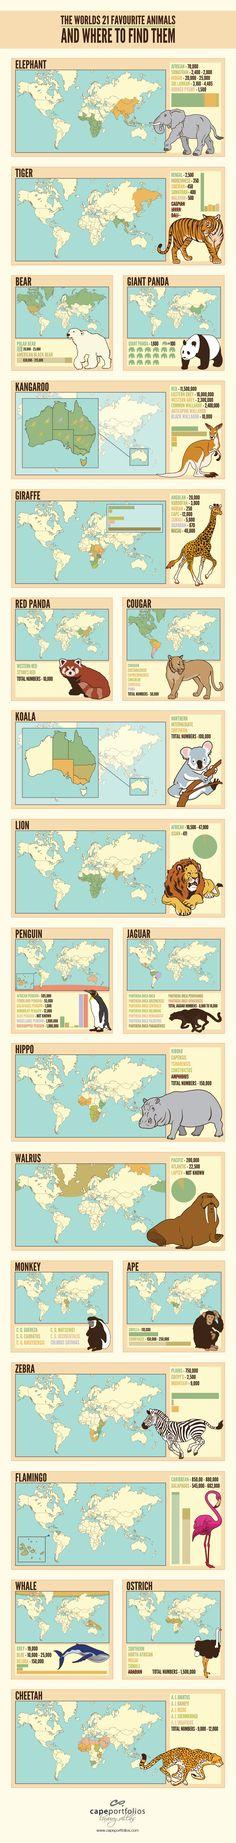 The Worlds 21 Favourite Animals & Where To Find Them - Elephant, Tiger, Polar Bear, American Black Bear, Giant Panda, Kangaroo, Red Panda, Cougar, Koala, Lion, Penguin, Jaguar, Hippo, Walrus, Monkey, Ape, Zebra, Flamingo, Whale, Ostrich & Cheetah